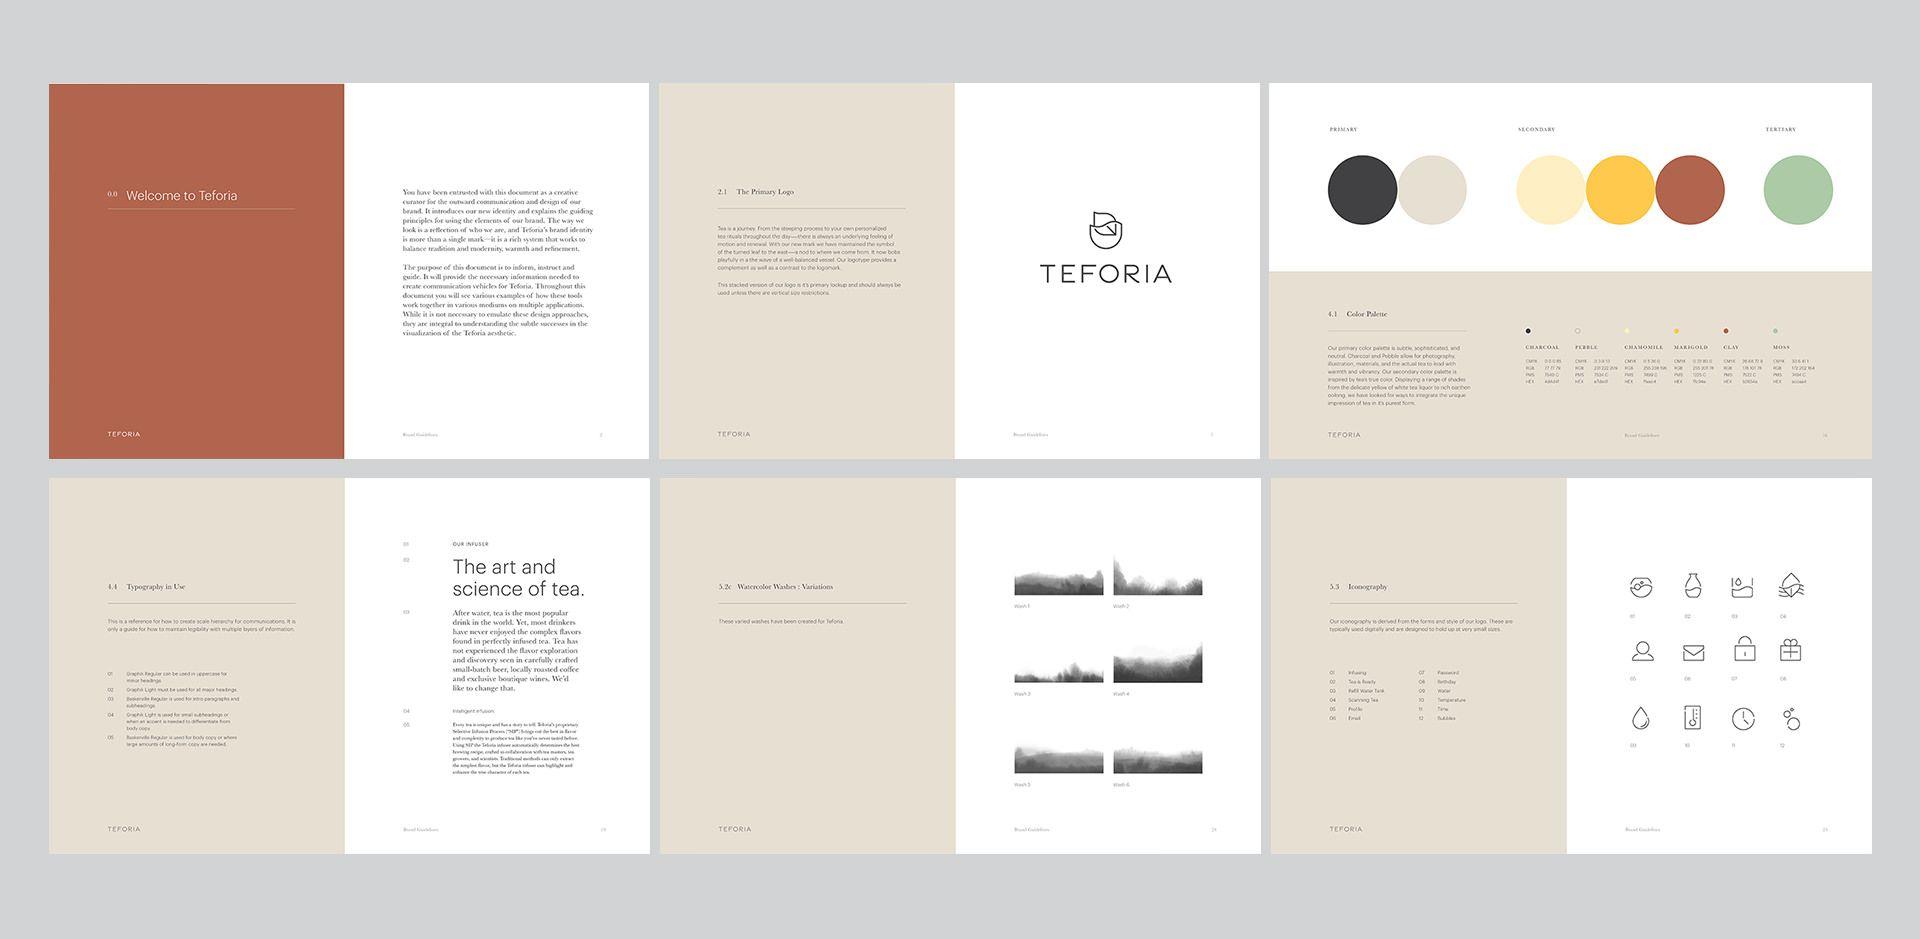 Teforia Branding Guidelines Brand Guidelines Brand Identity Guidelines Brand Book